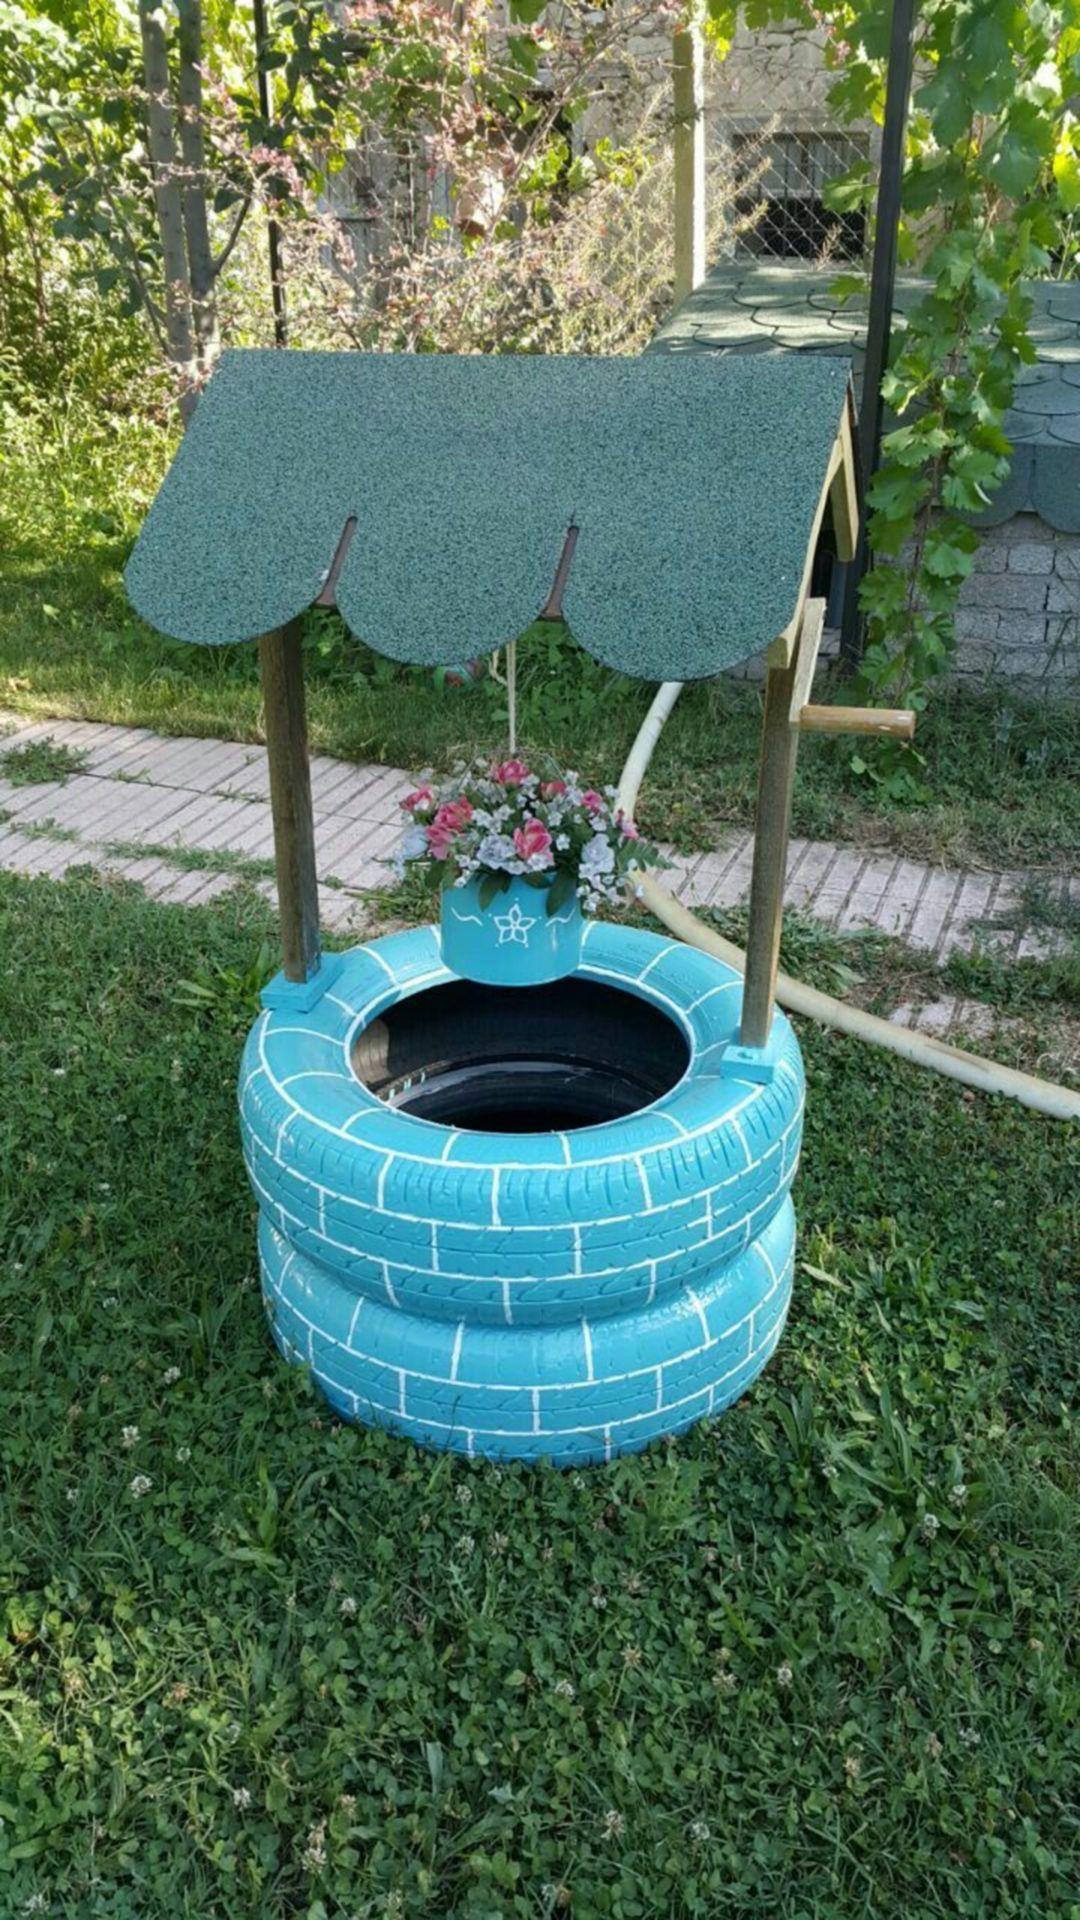 Garden decor with tyres   Impressive DIY Tire Planters Ideas for Your Garden To Amaze